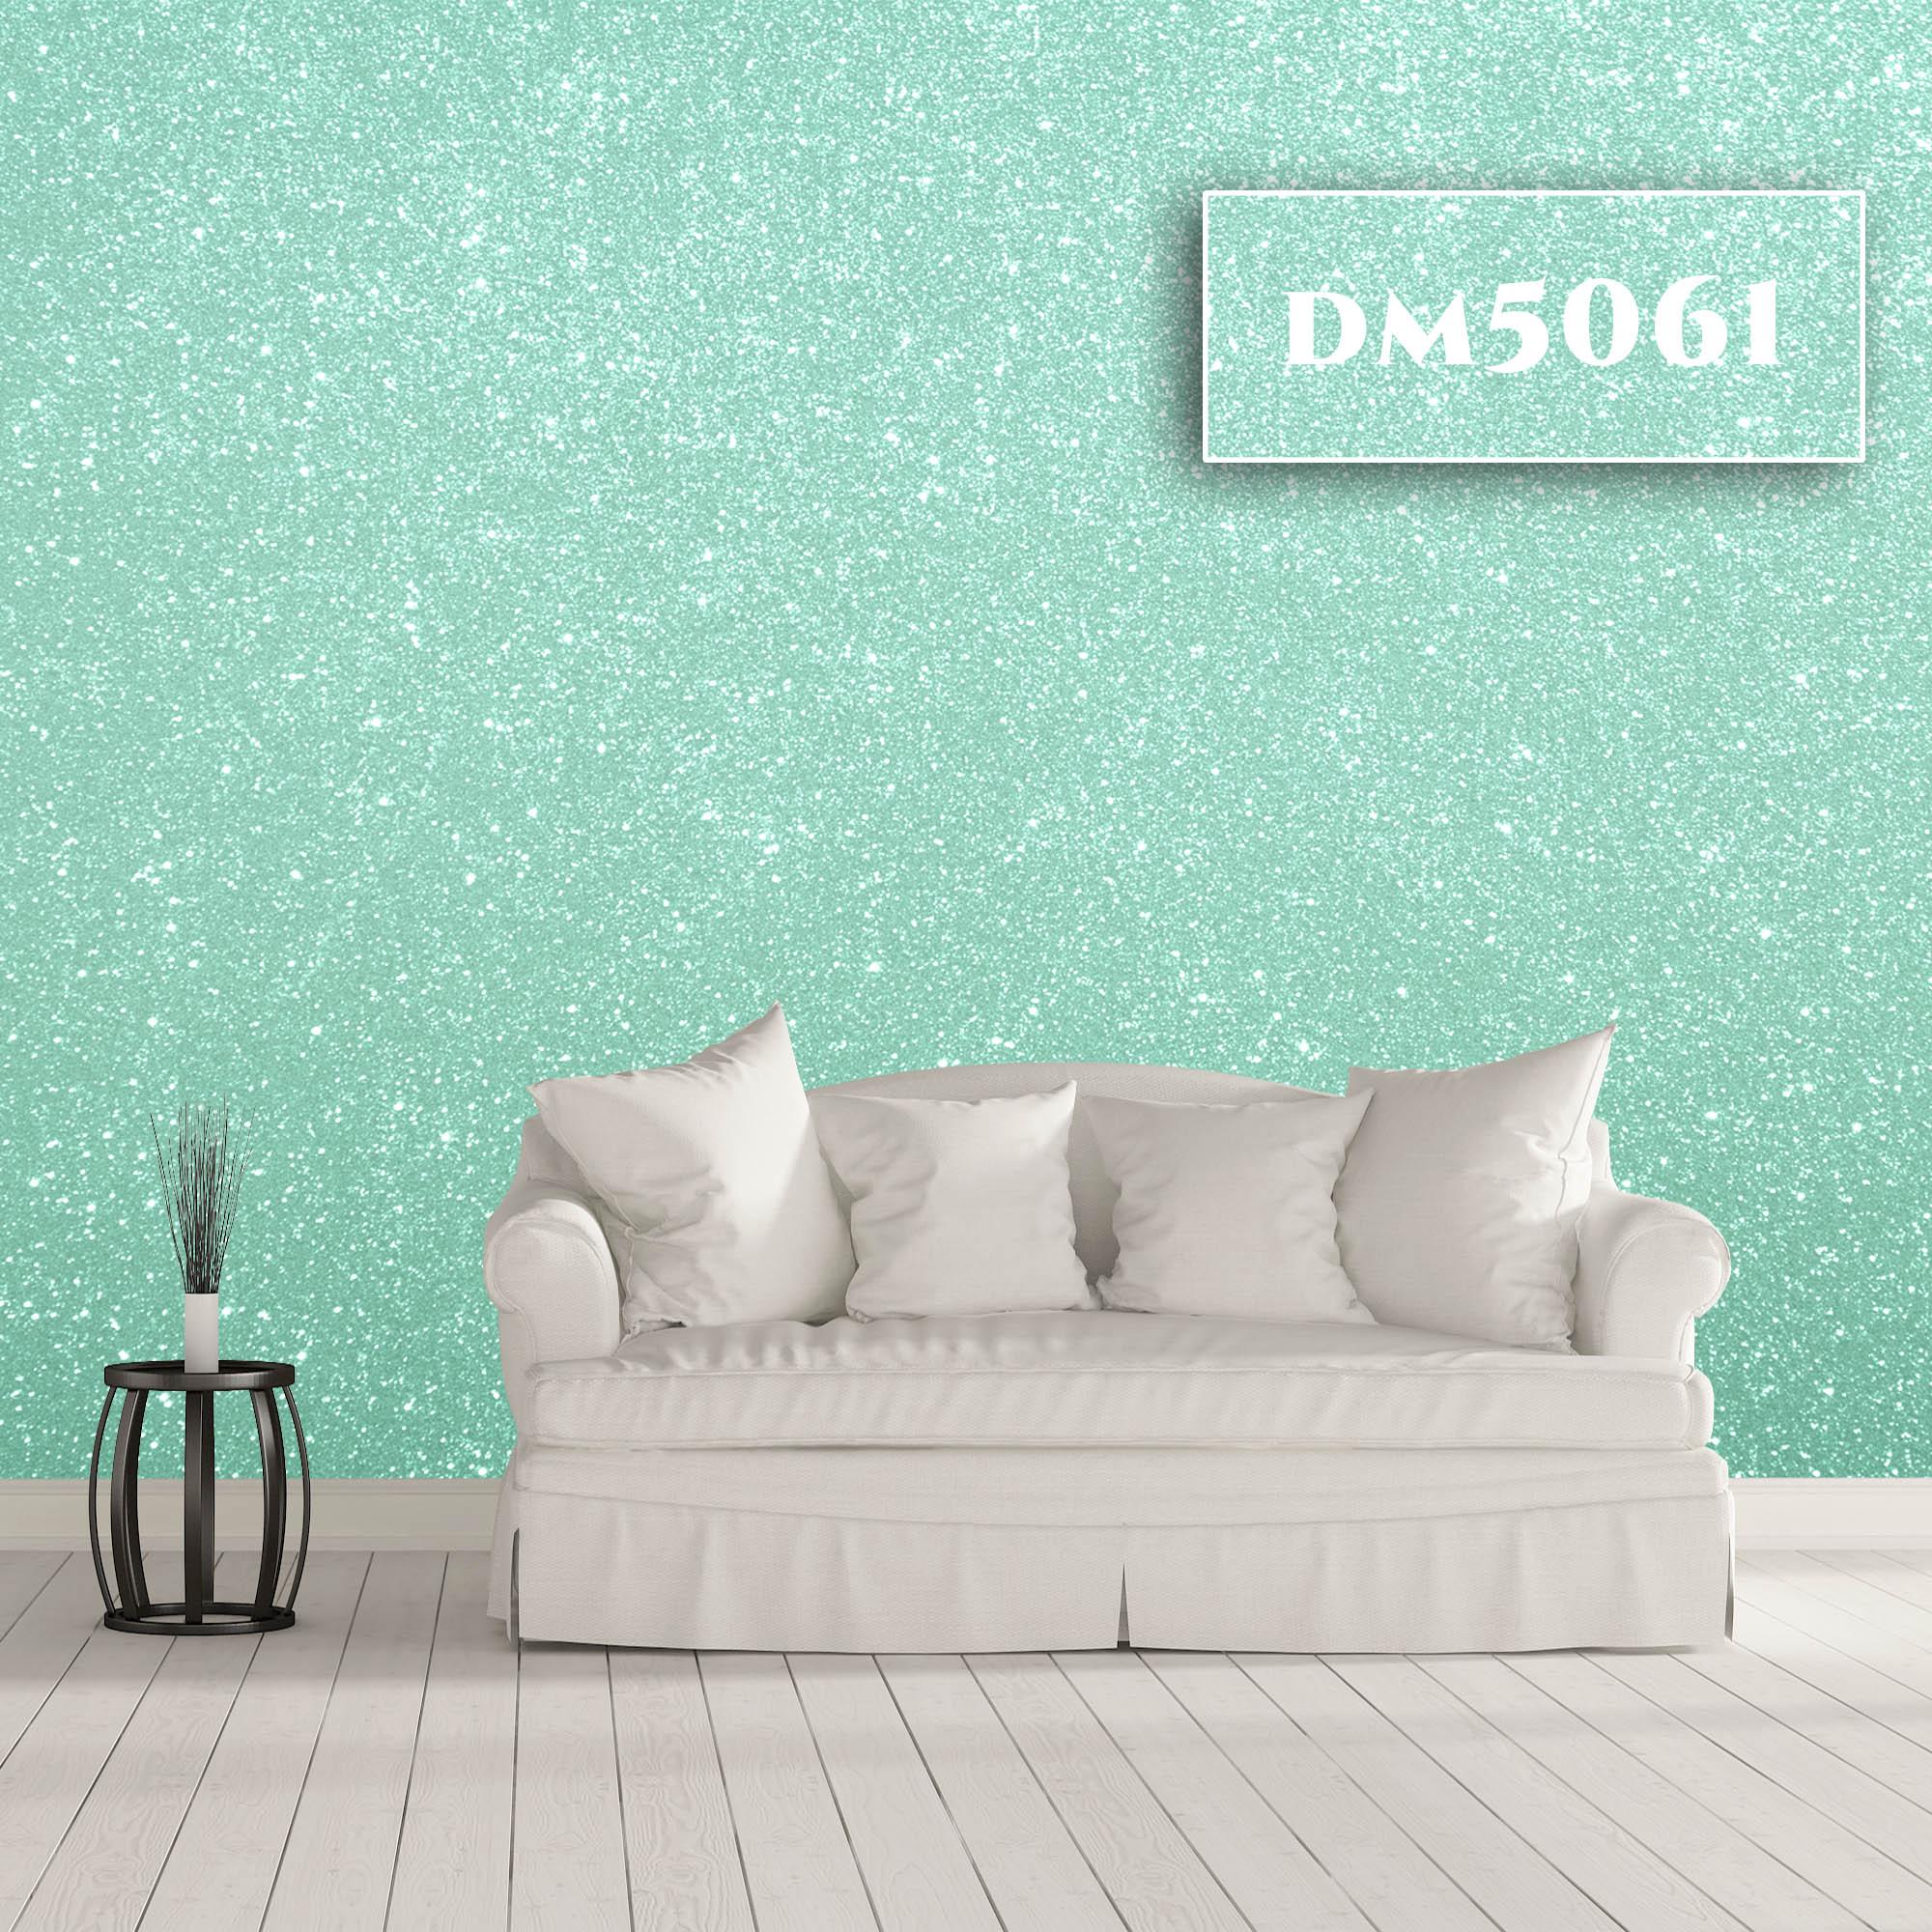 DM5061